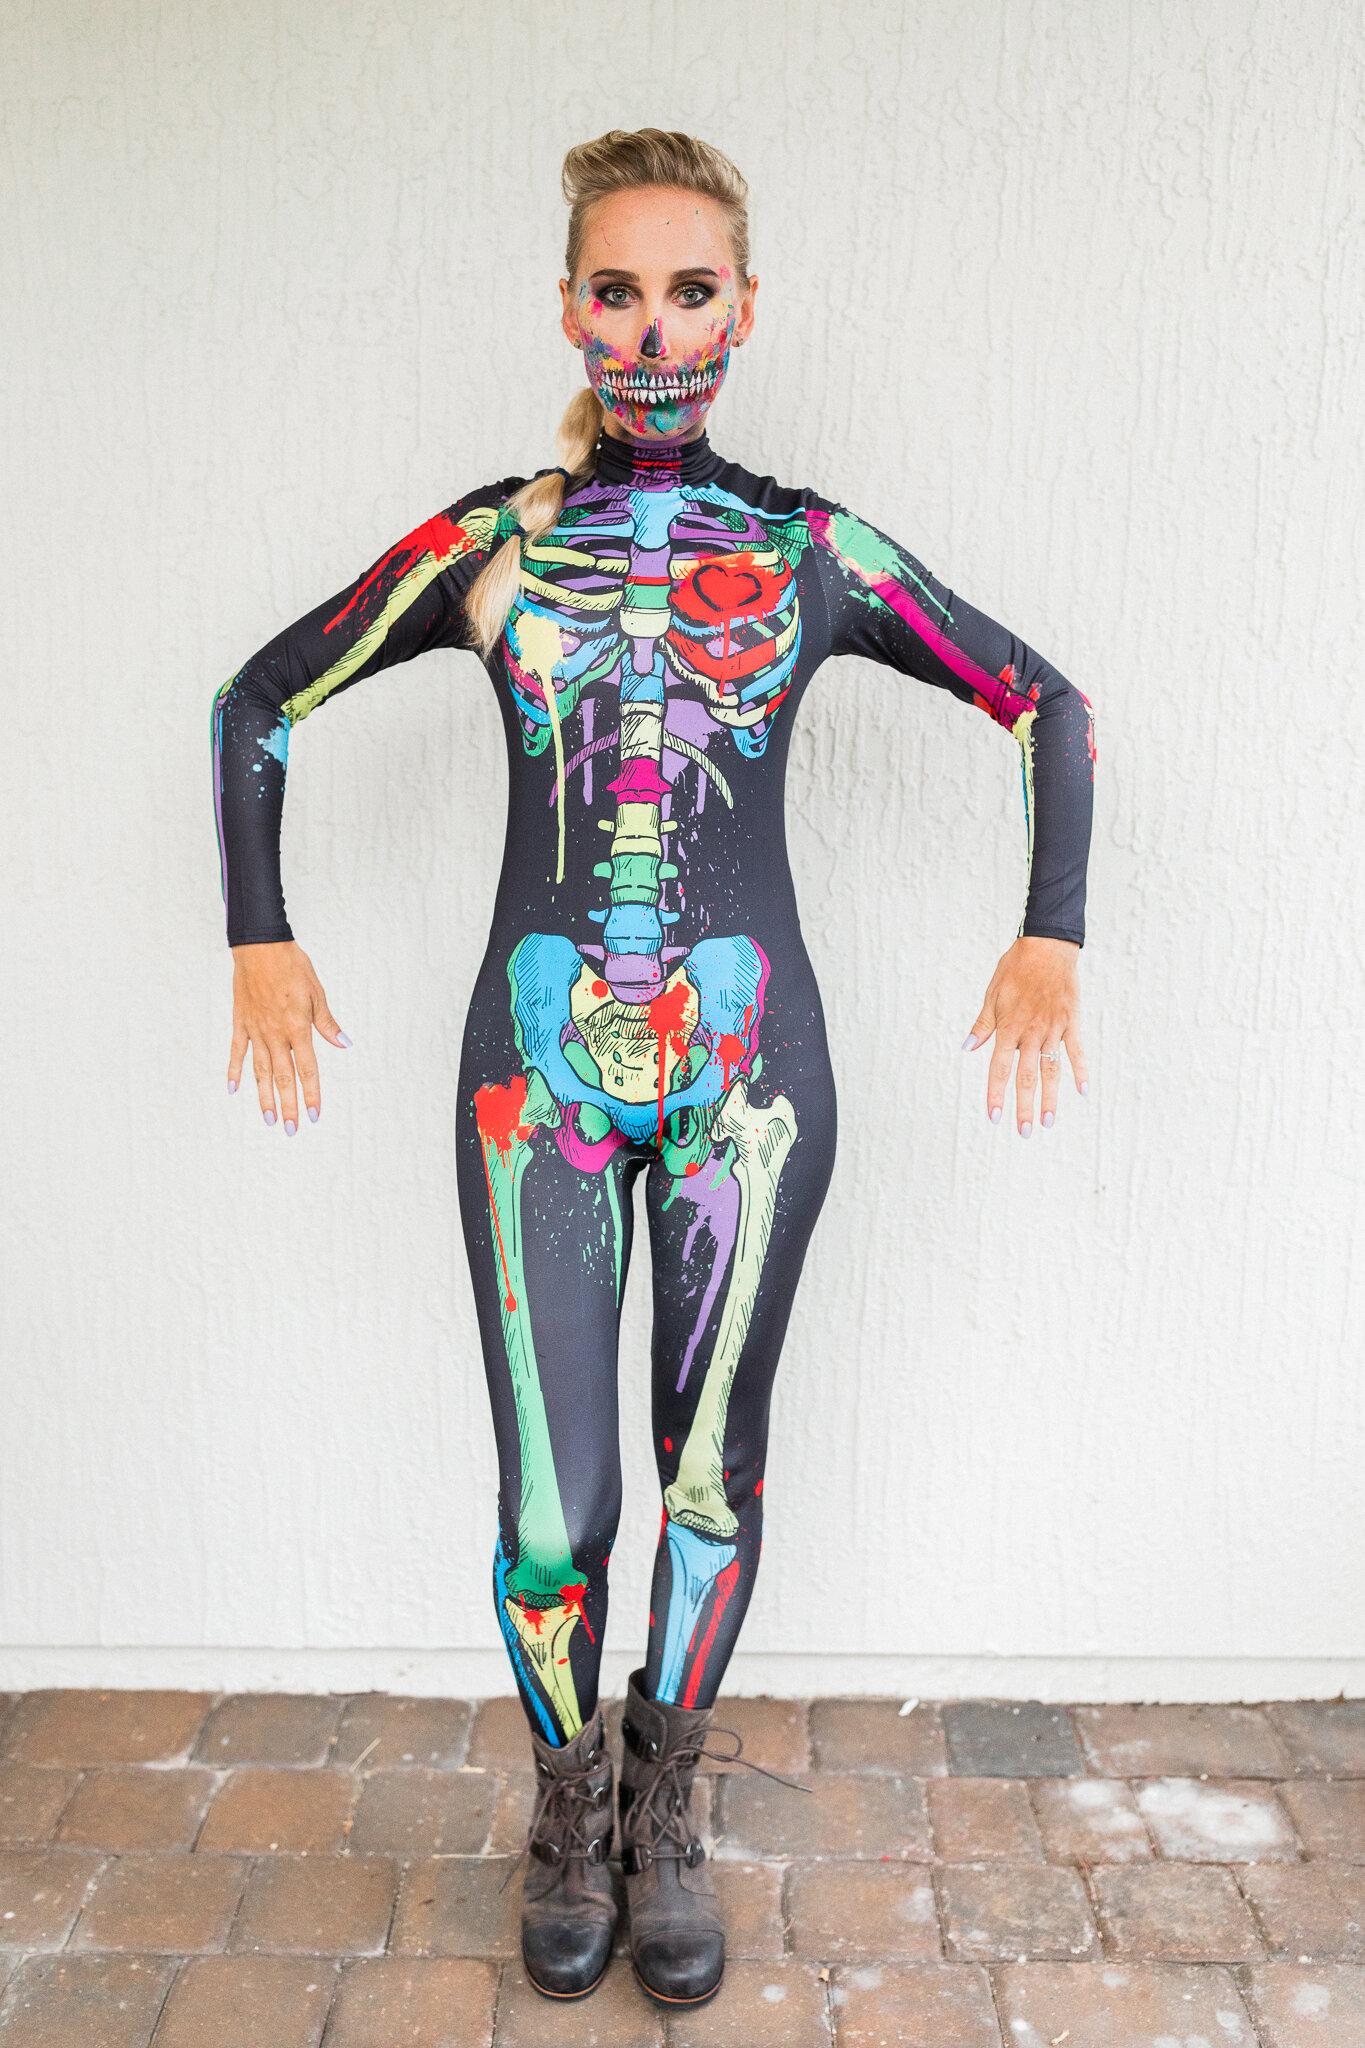 Halloween skeleton costume from Amazon